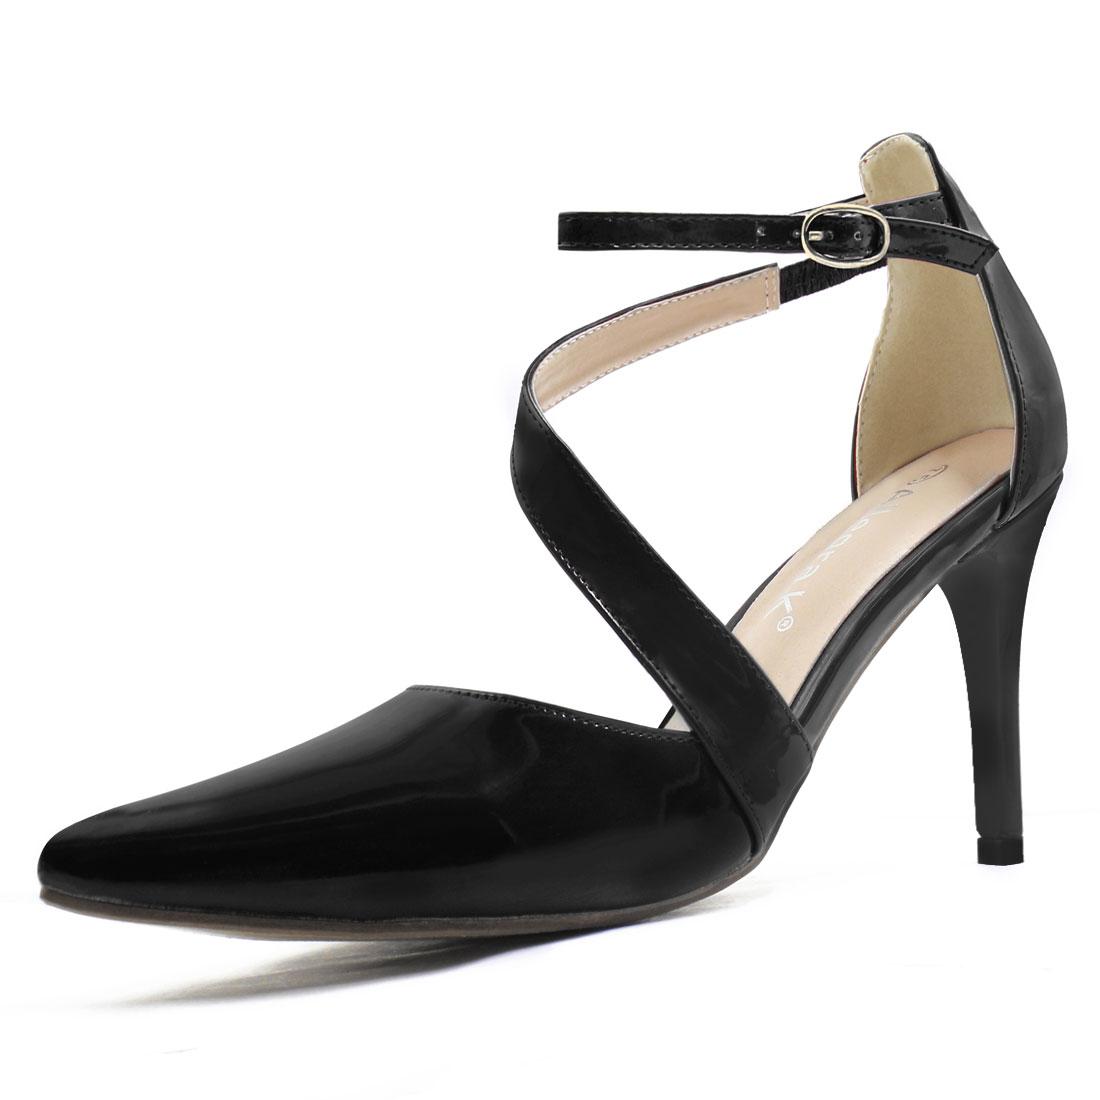 Women Asymmetrical Strap Stiletto Heel Pointy-Toe Pumps Black US 7